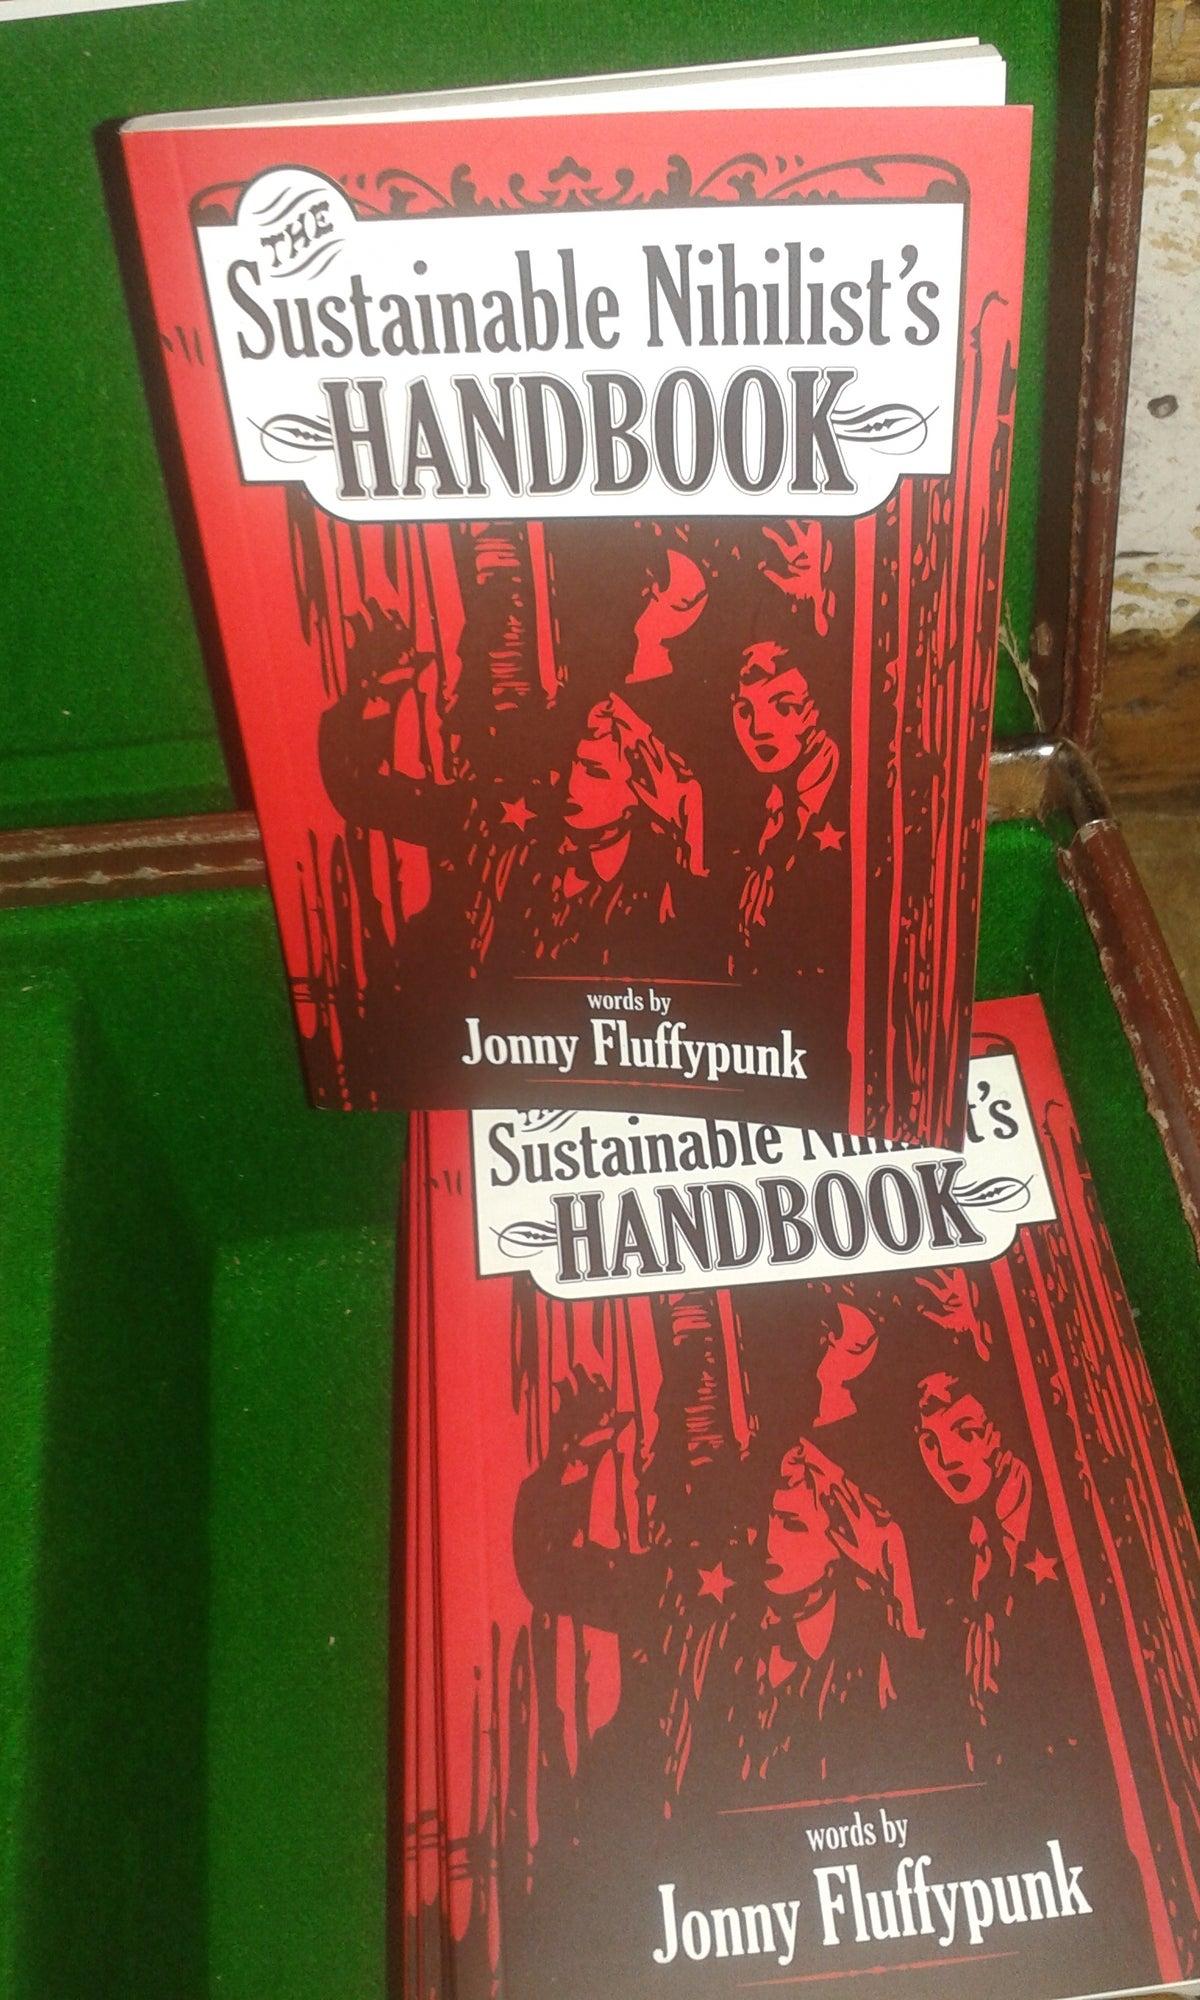 Image of Sustainable Nihilist's Handbook